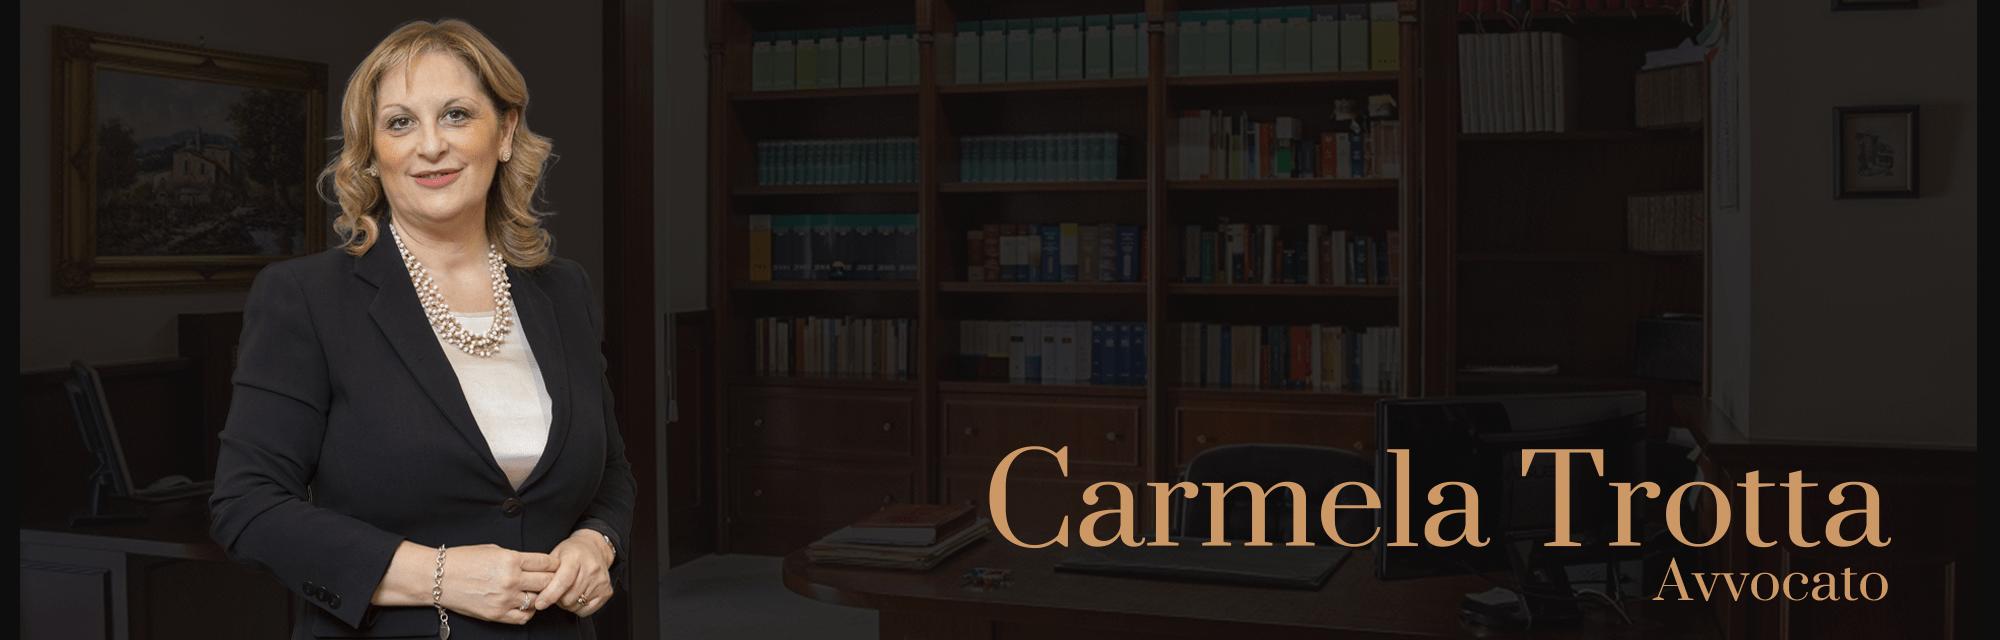 Avvocato Carmela Trotta